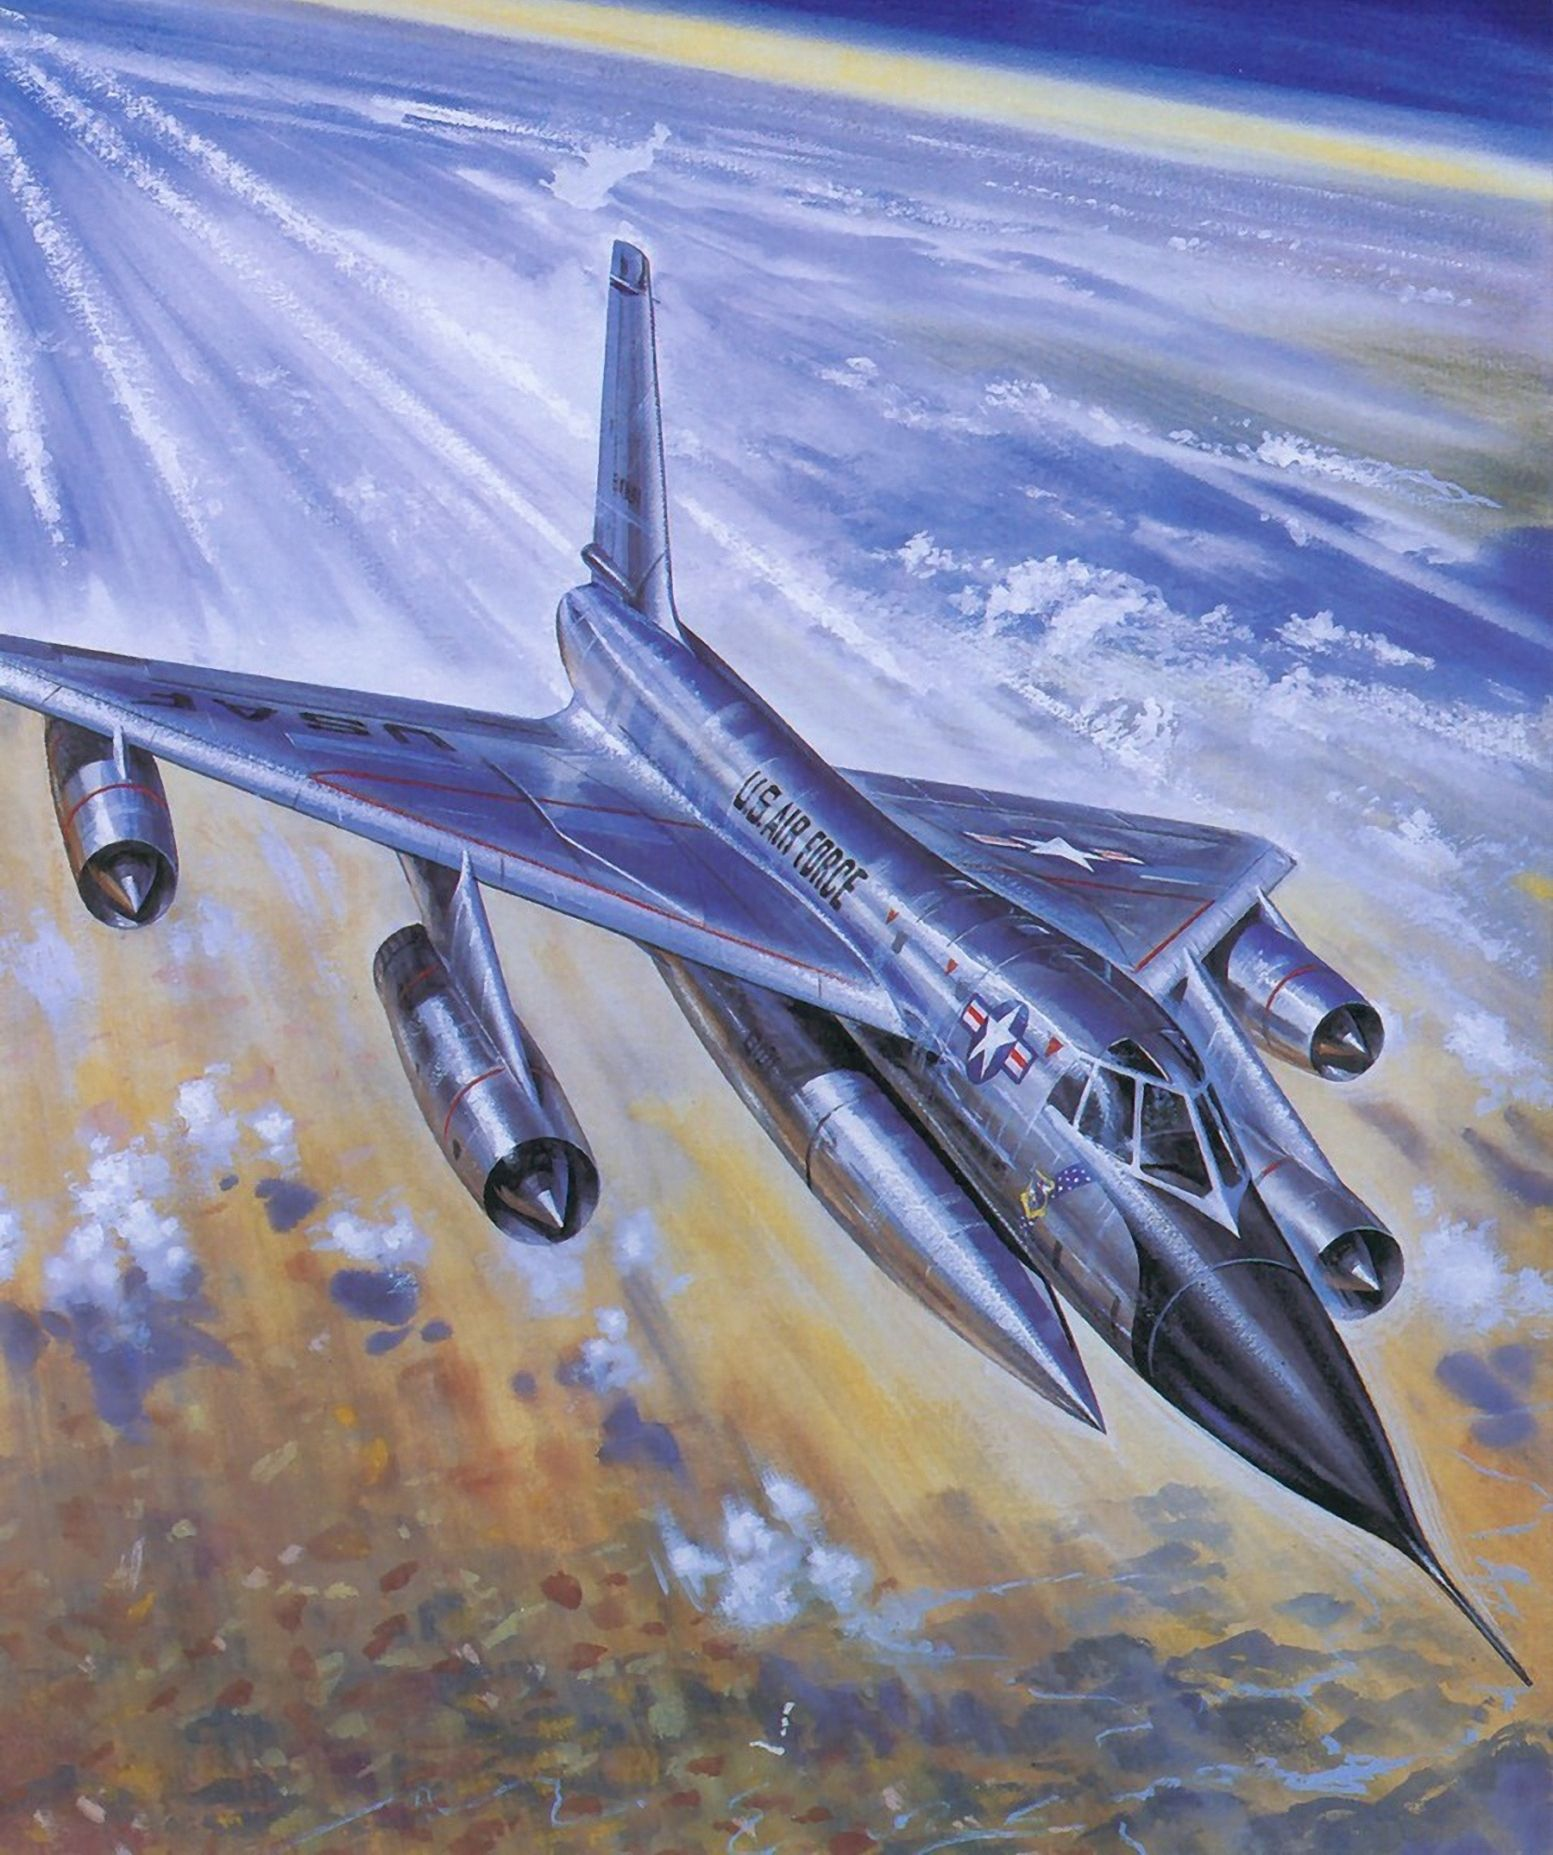 US JET INTERCEPTING RUSSIAN BOMBWE PAINTING MILITARY HISTORY ART CANVAS PRINT